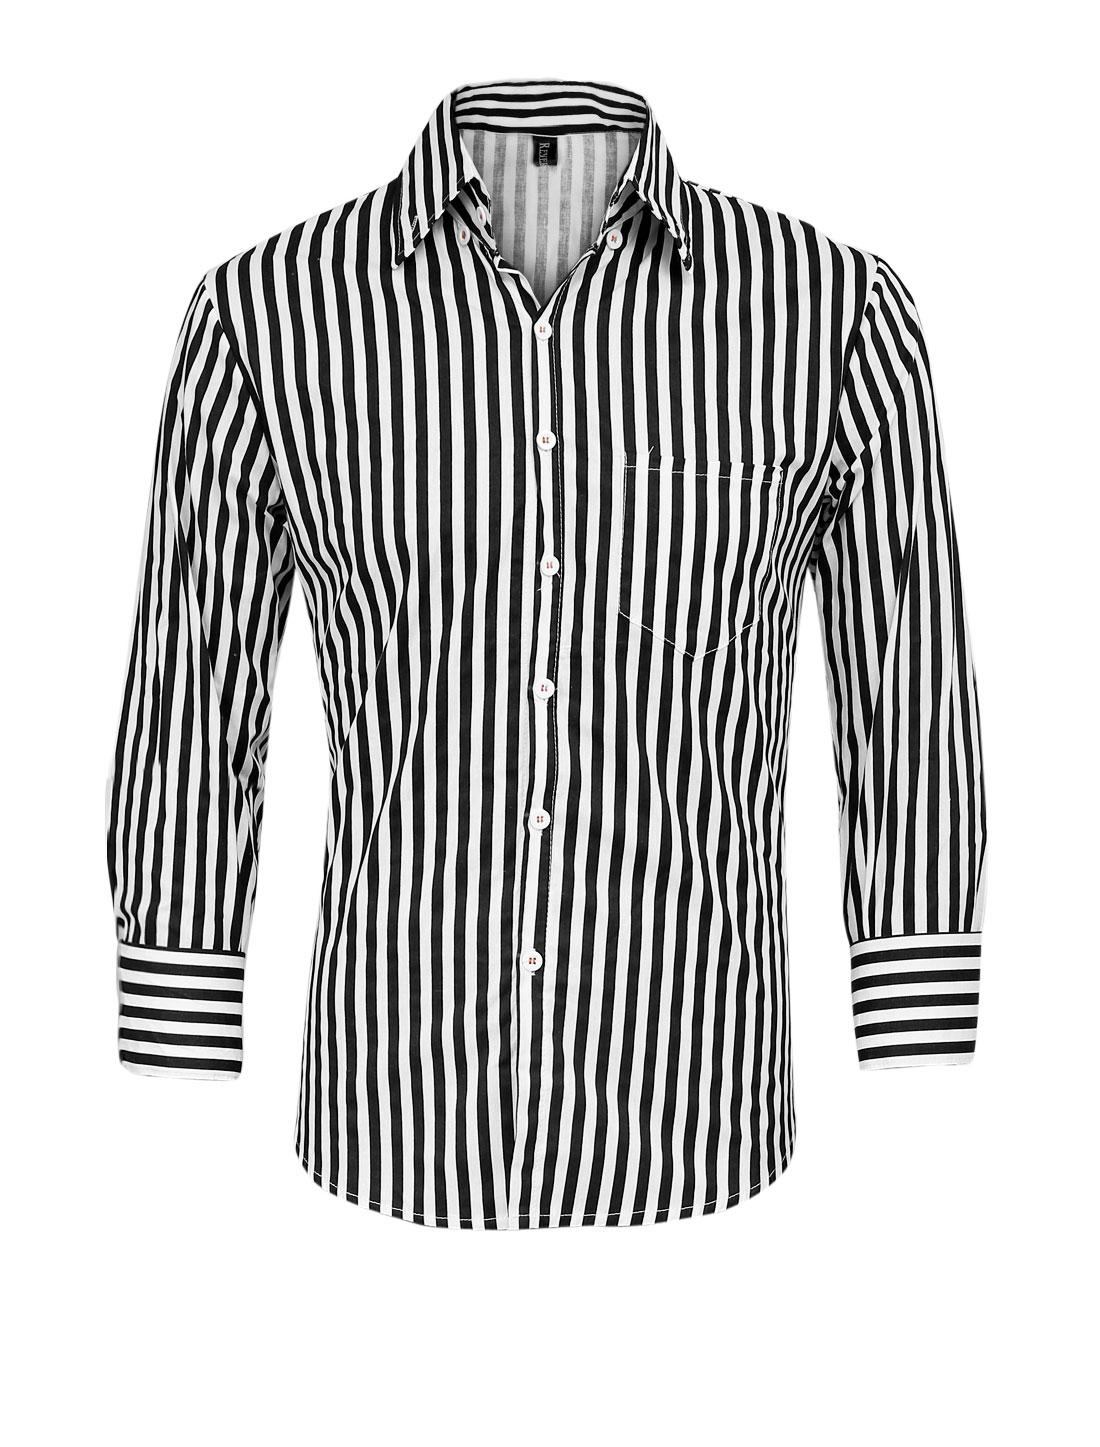 Men Buttons Cuffs Vertical Stripes Pattern Slim Fit Shirt Black M